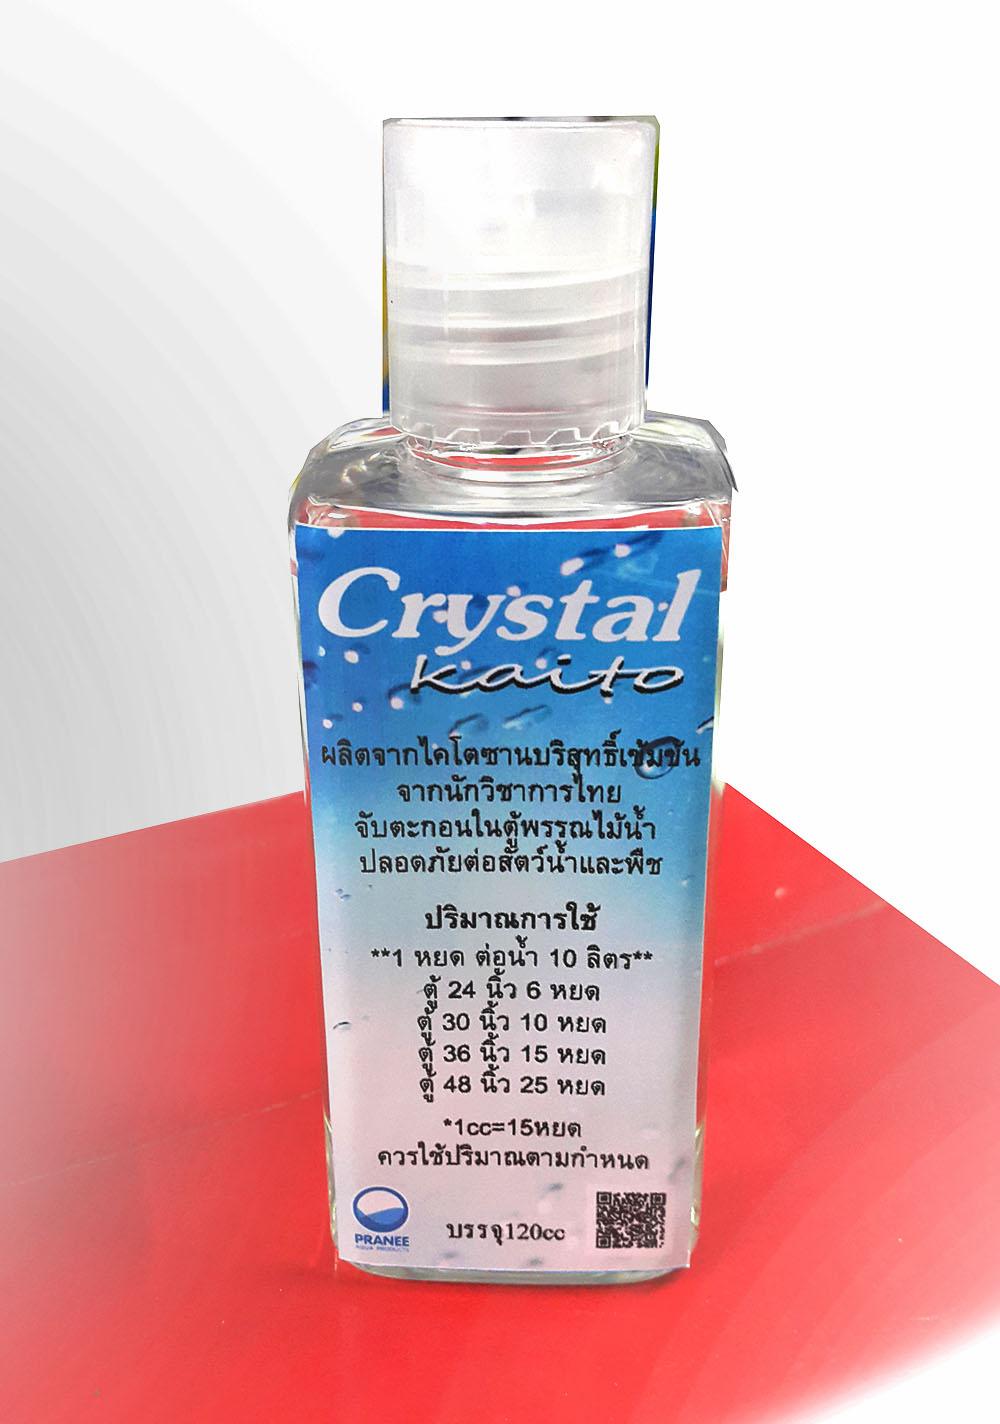 CrystalKaito คริสตัลไคโต